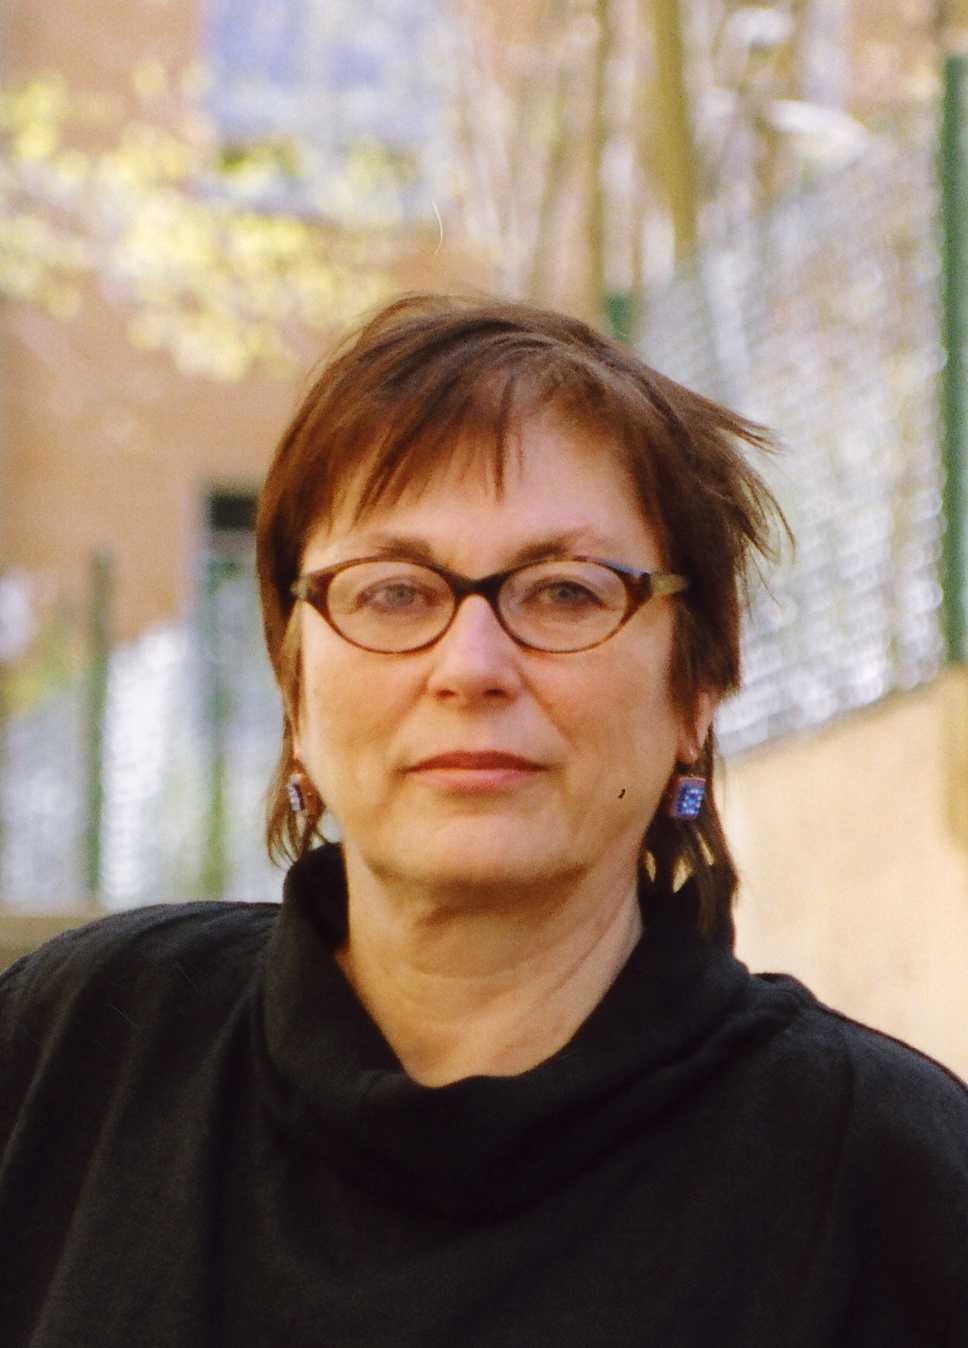 Anita Oxburgh